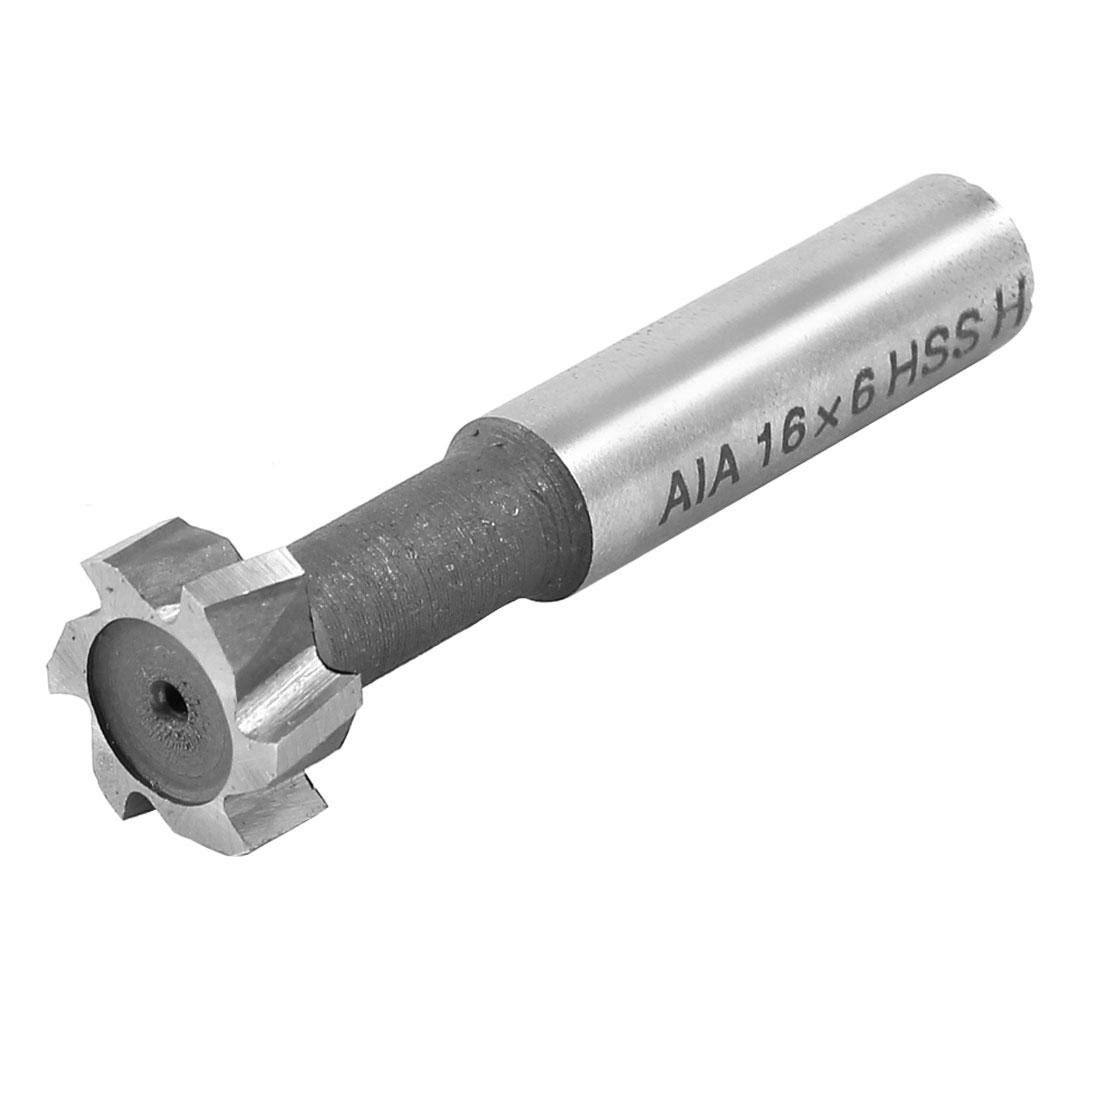 16mm Cutting Dia 6 Flutes HSS AL T Slot End Mill Milling Cutter